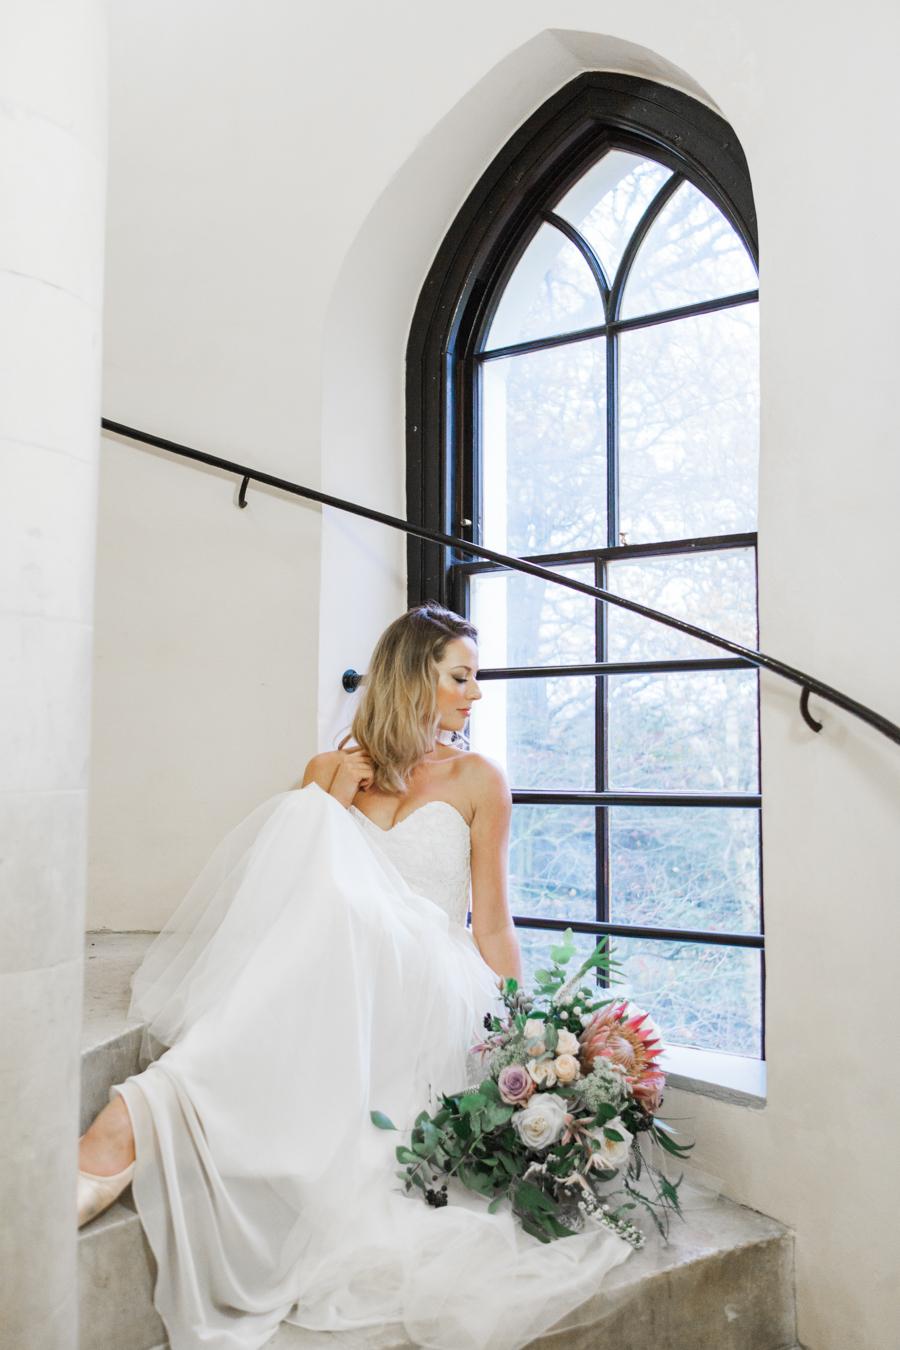 Starry celestial wedding inspiration (with a sprinkling of Disney magic) - Amanda Karen Photography (18)